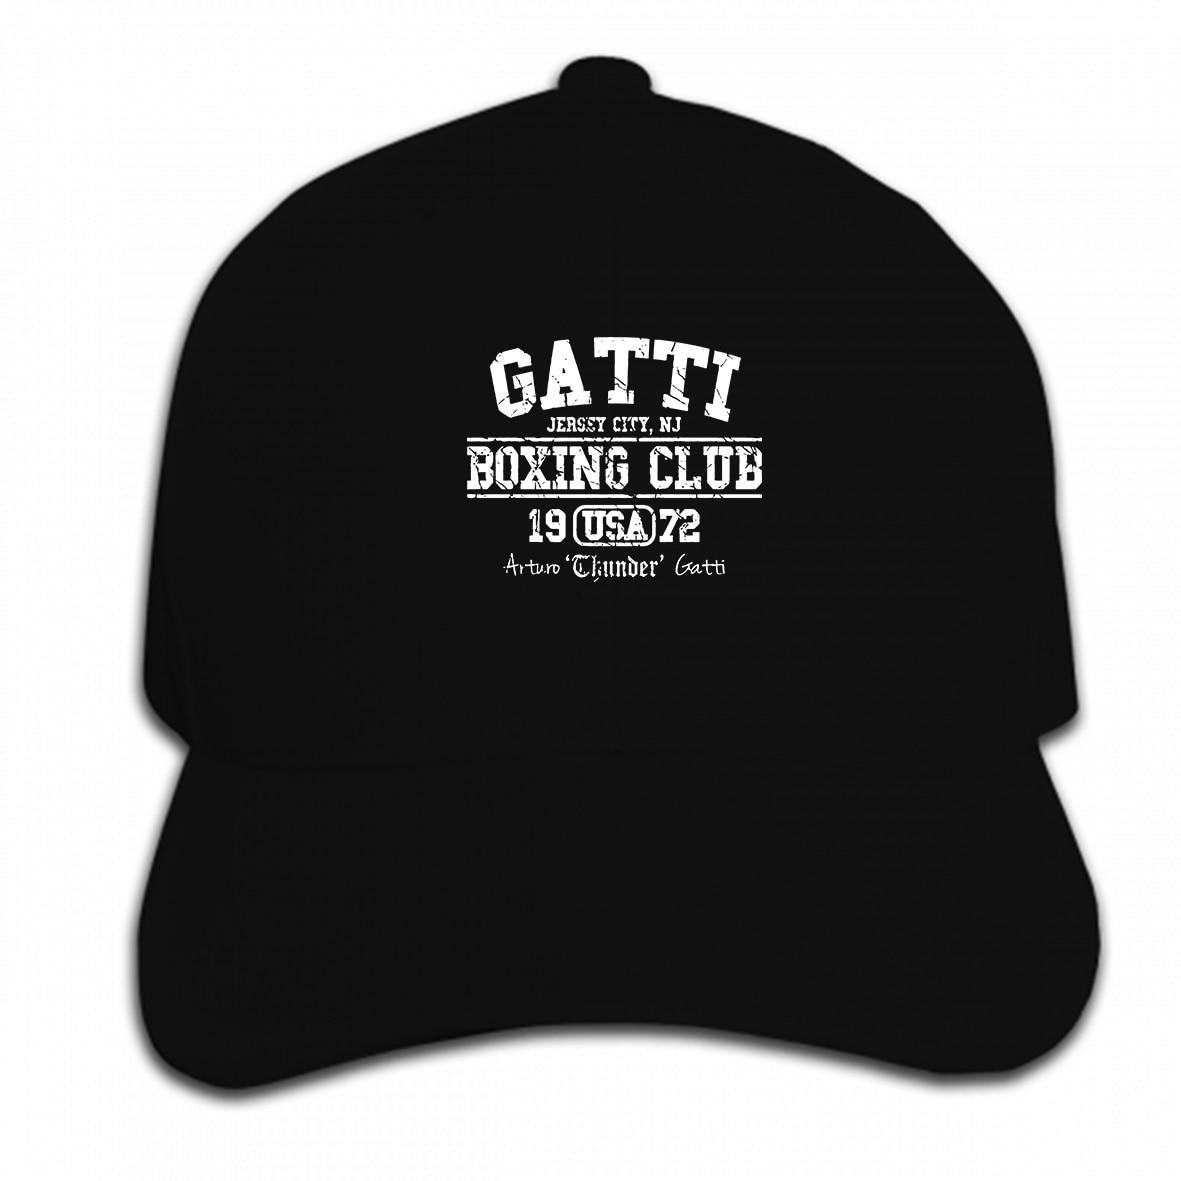 Print Custom Baseball Cap GATTI ARTURO In All Color Hat Peaked Cap